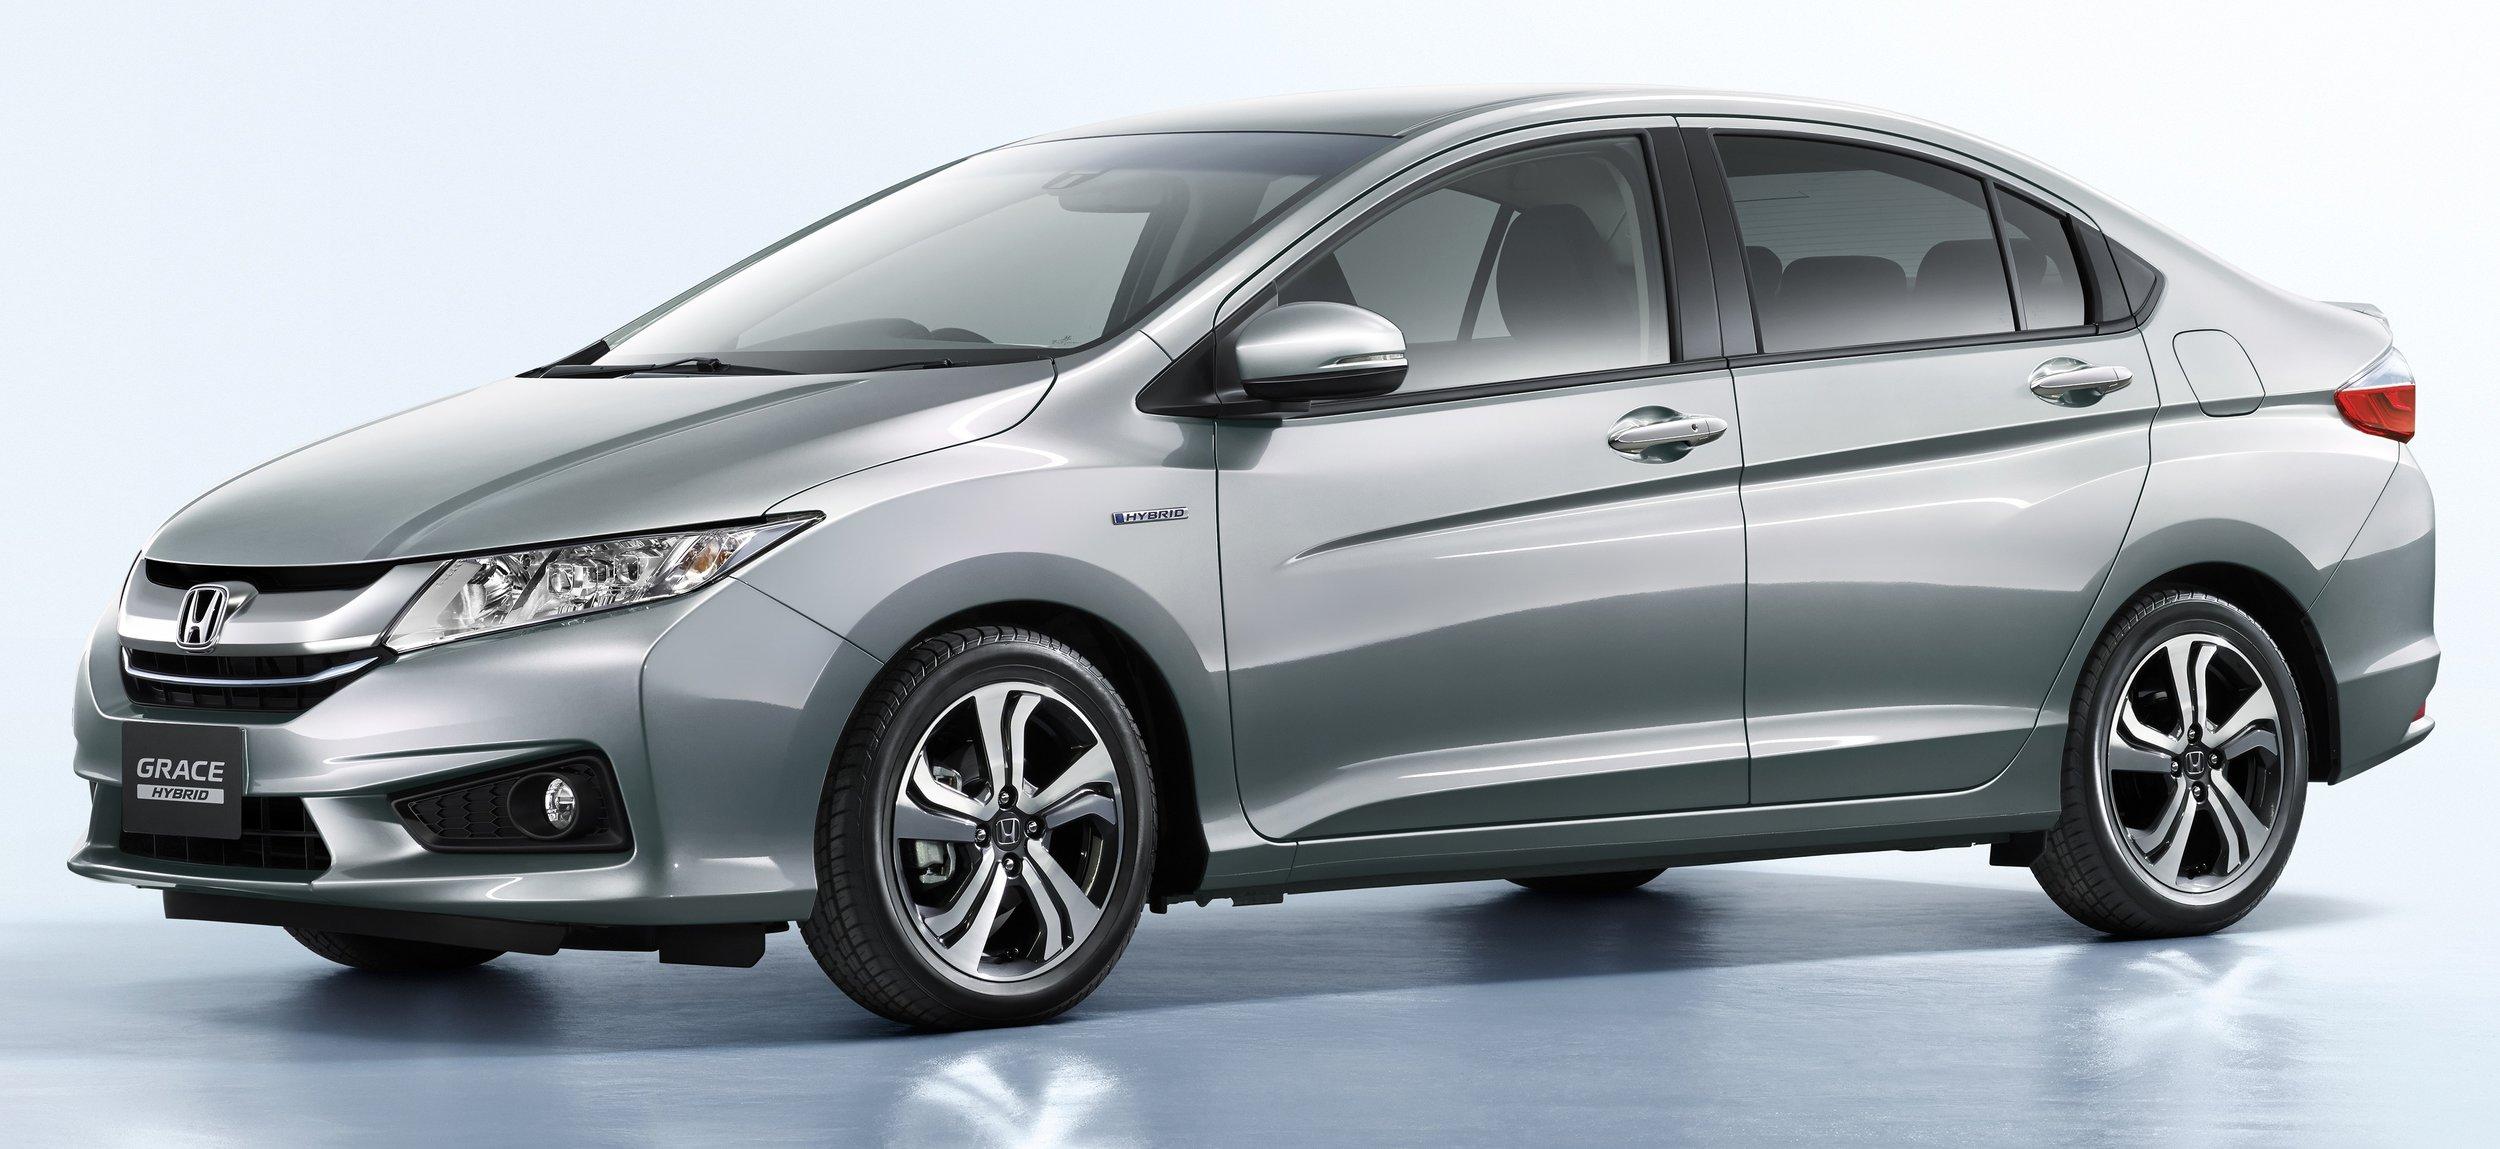 Honda_Grace_Honda_City_Hybrid_02-e1445584450720.jpg